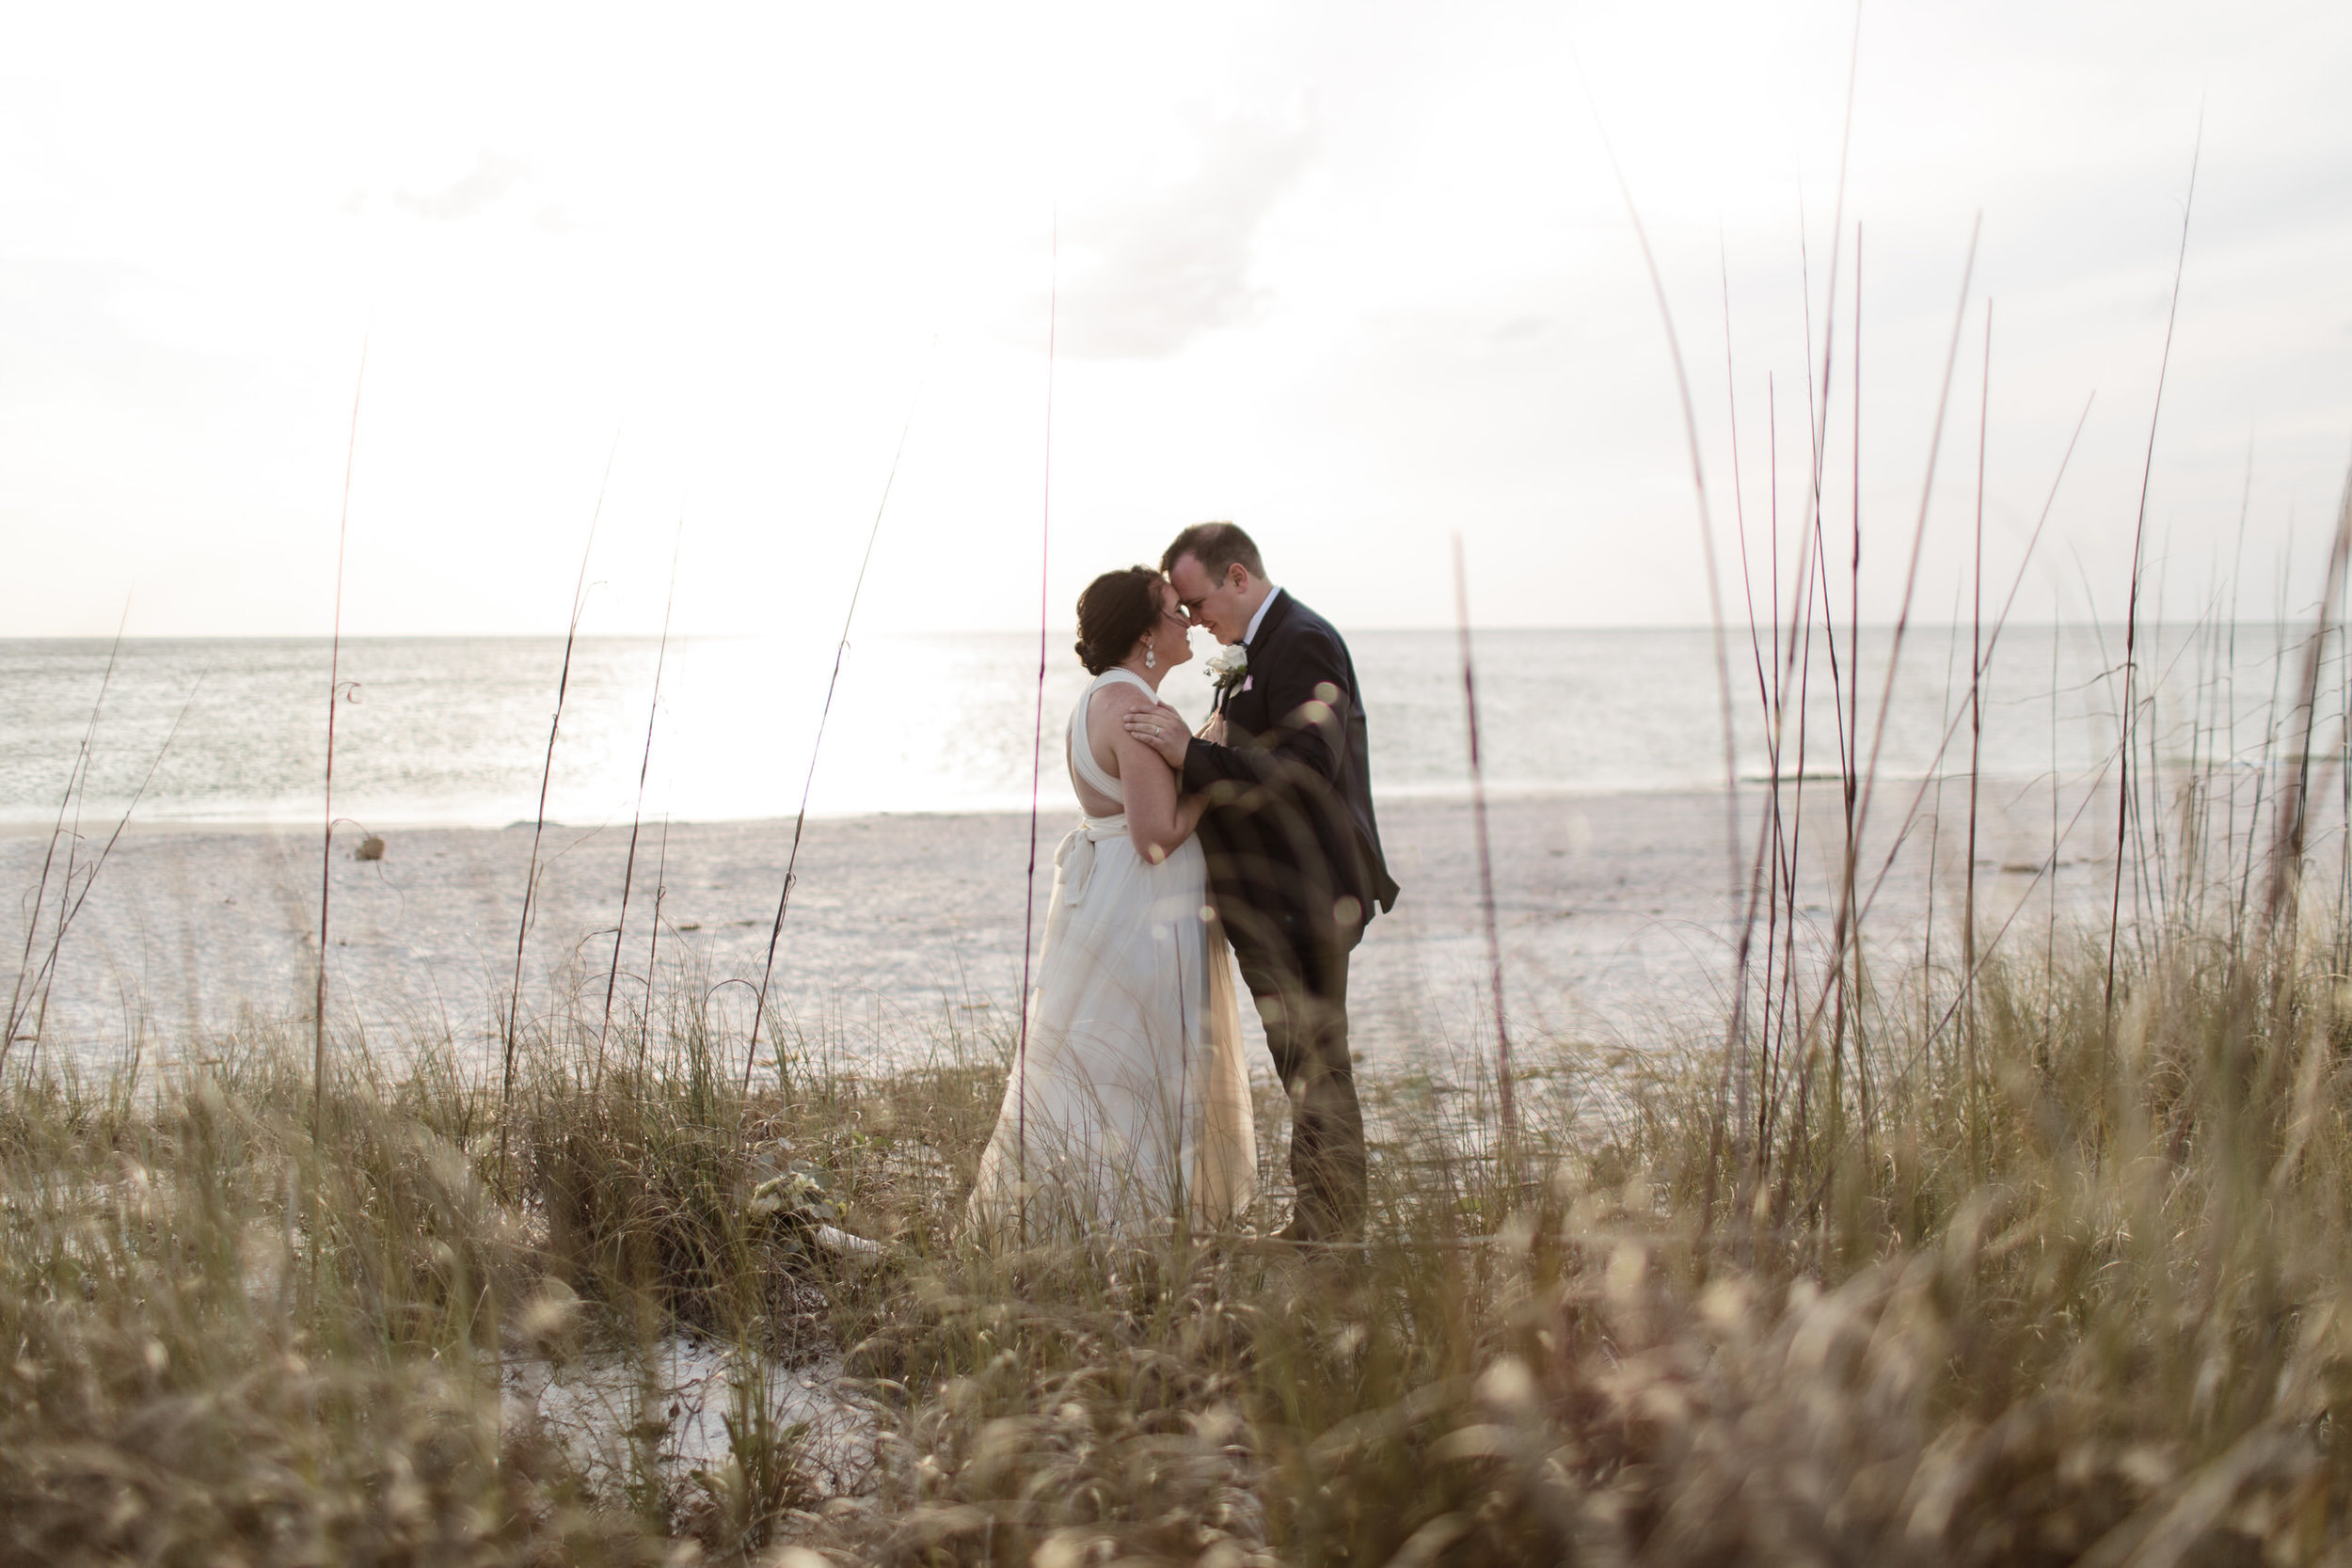 Beltran_Treasure_Island_Elopement_Tampa_Wedding_097-1.jpg